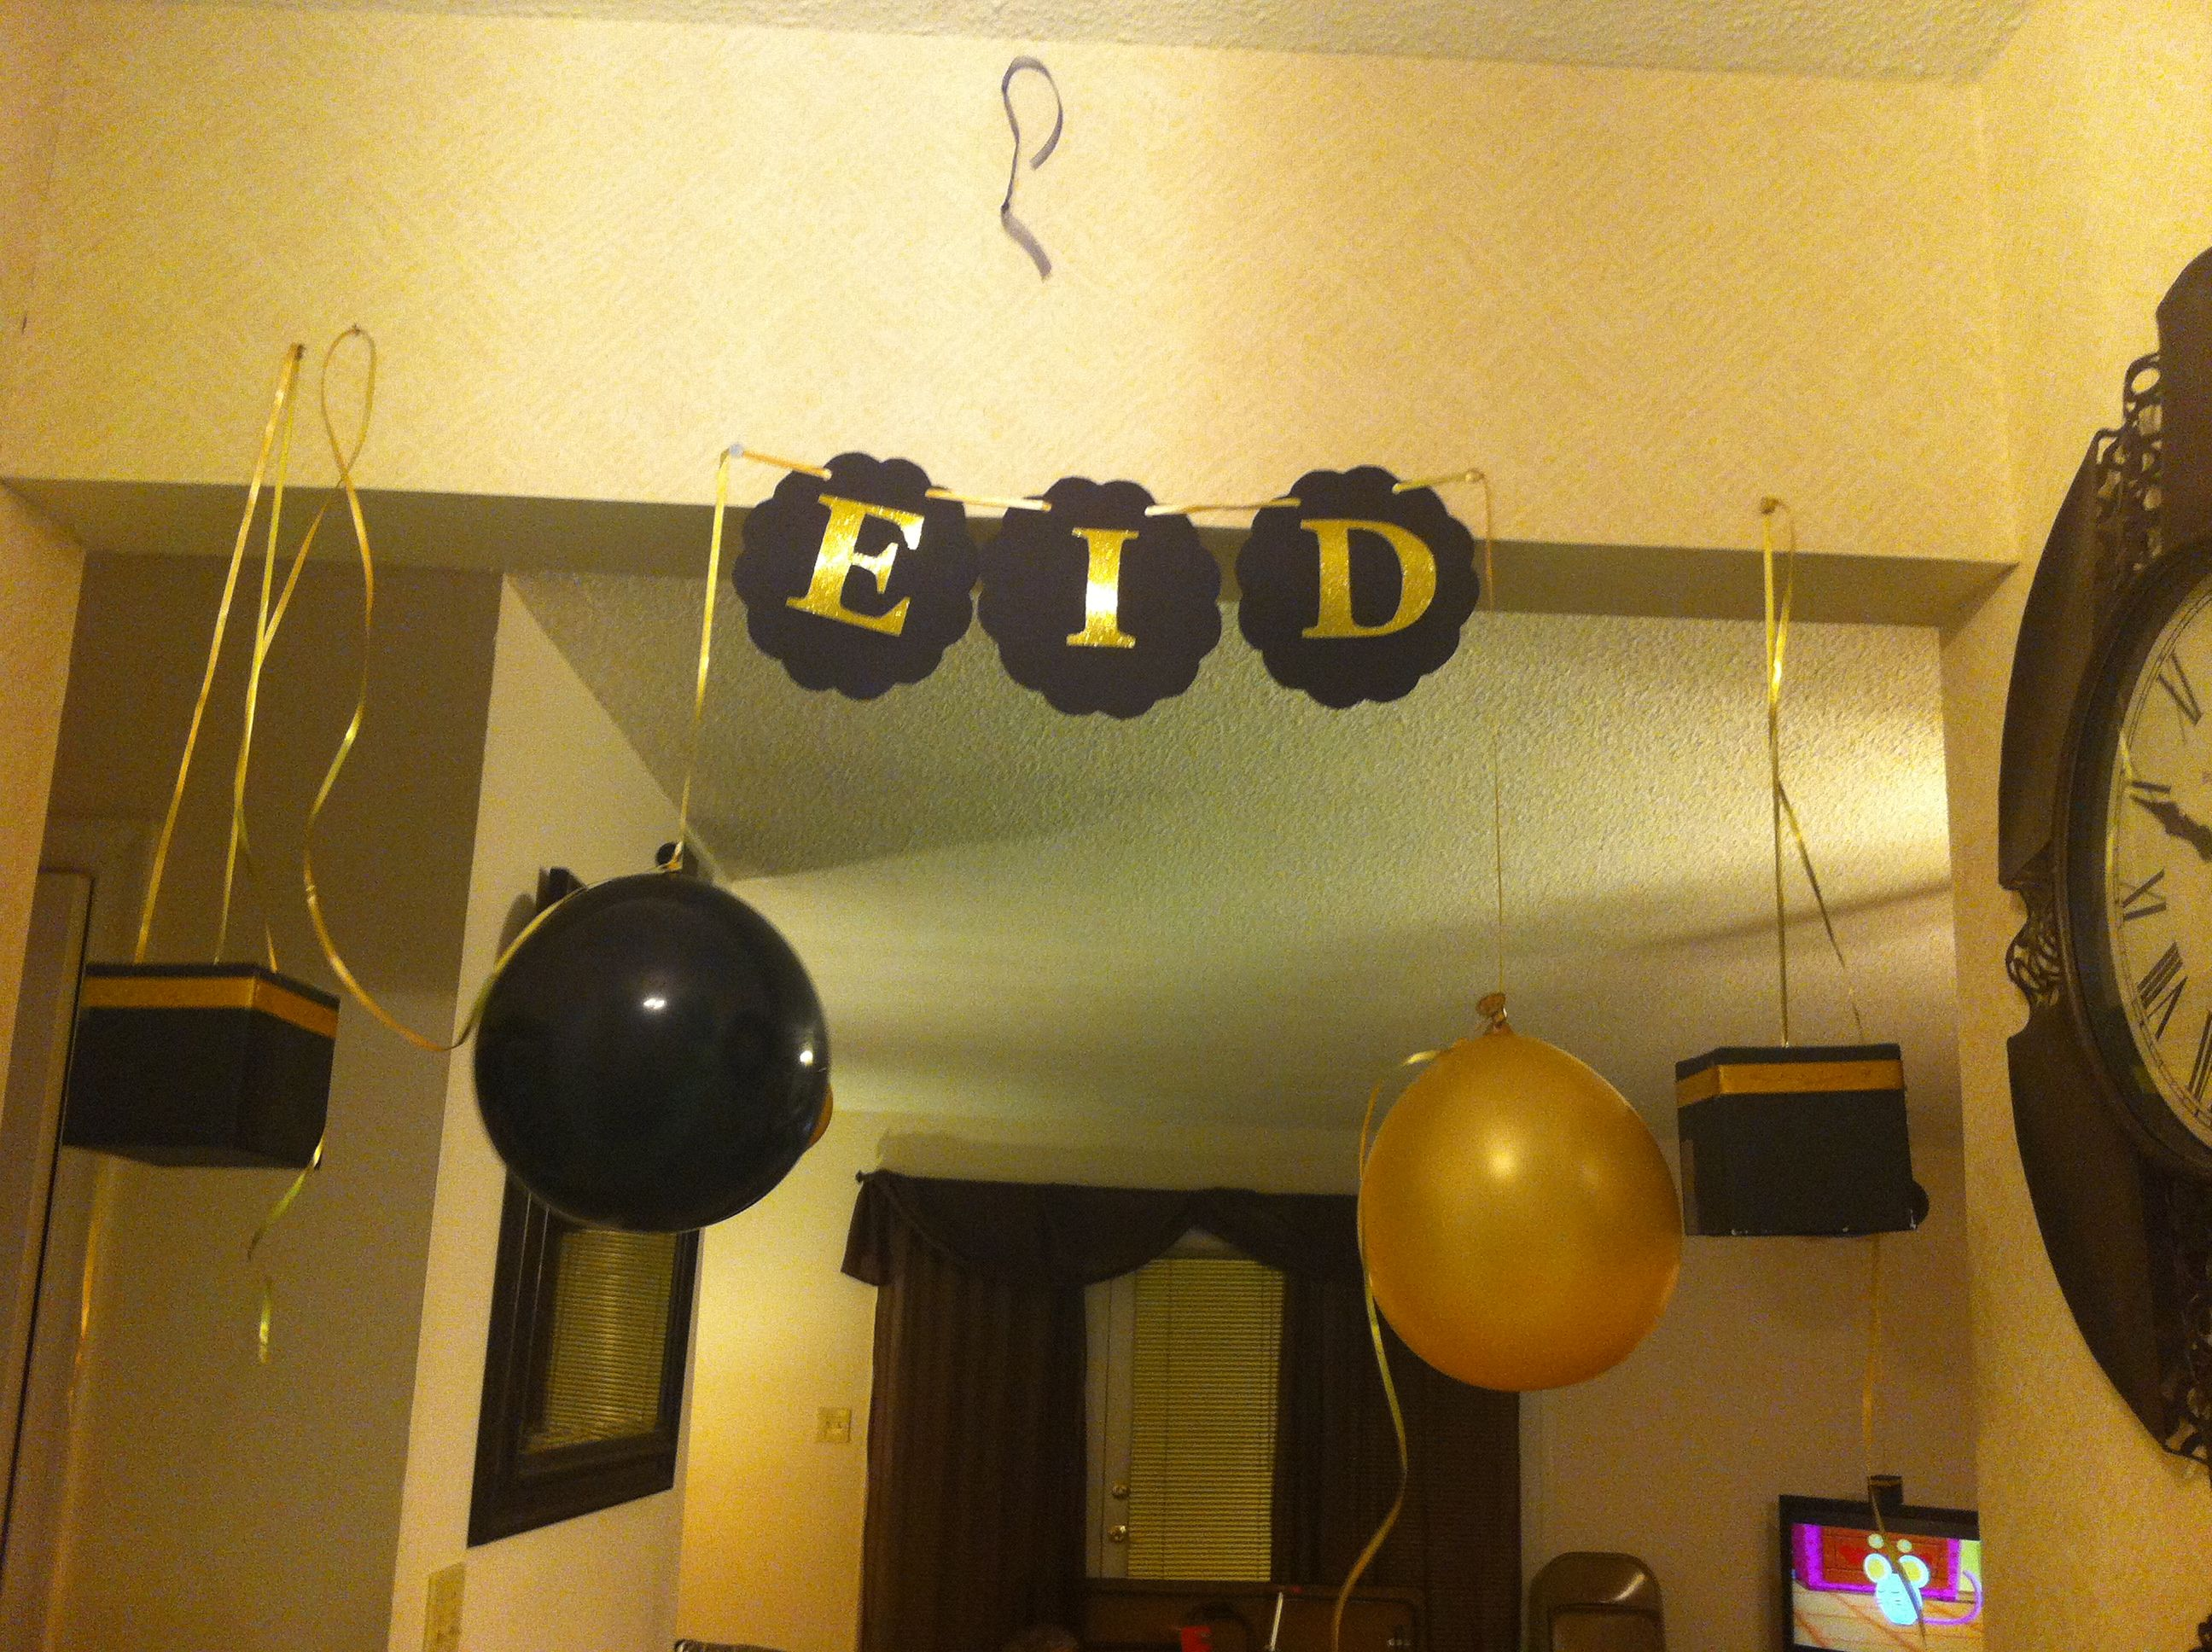 Eid Al Adha Decorations Yakout House Eid Pinterest Eid Decoration And Ramadan